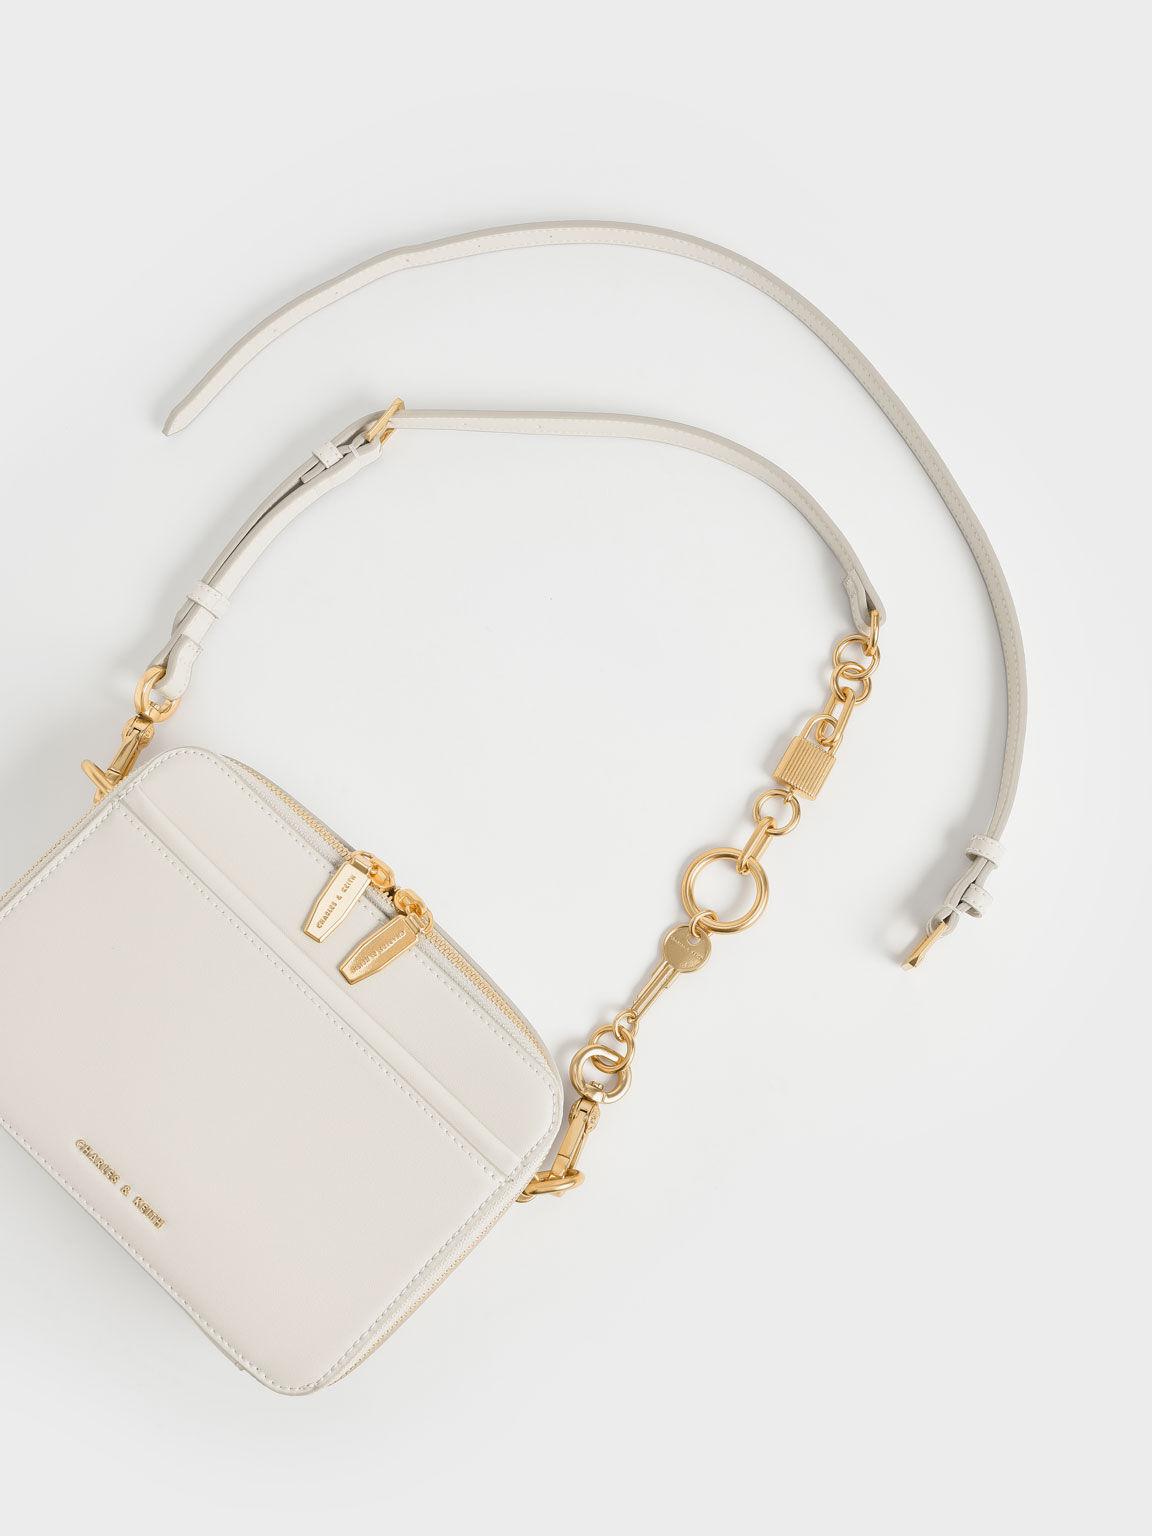 Chunky Chain Handle Two-Way Zip Crossbody Bag, Cream, hi-res